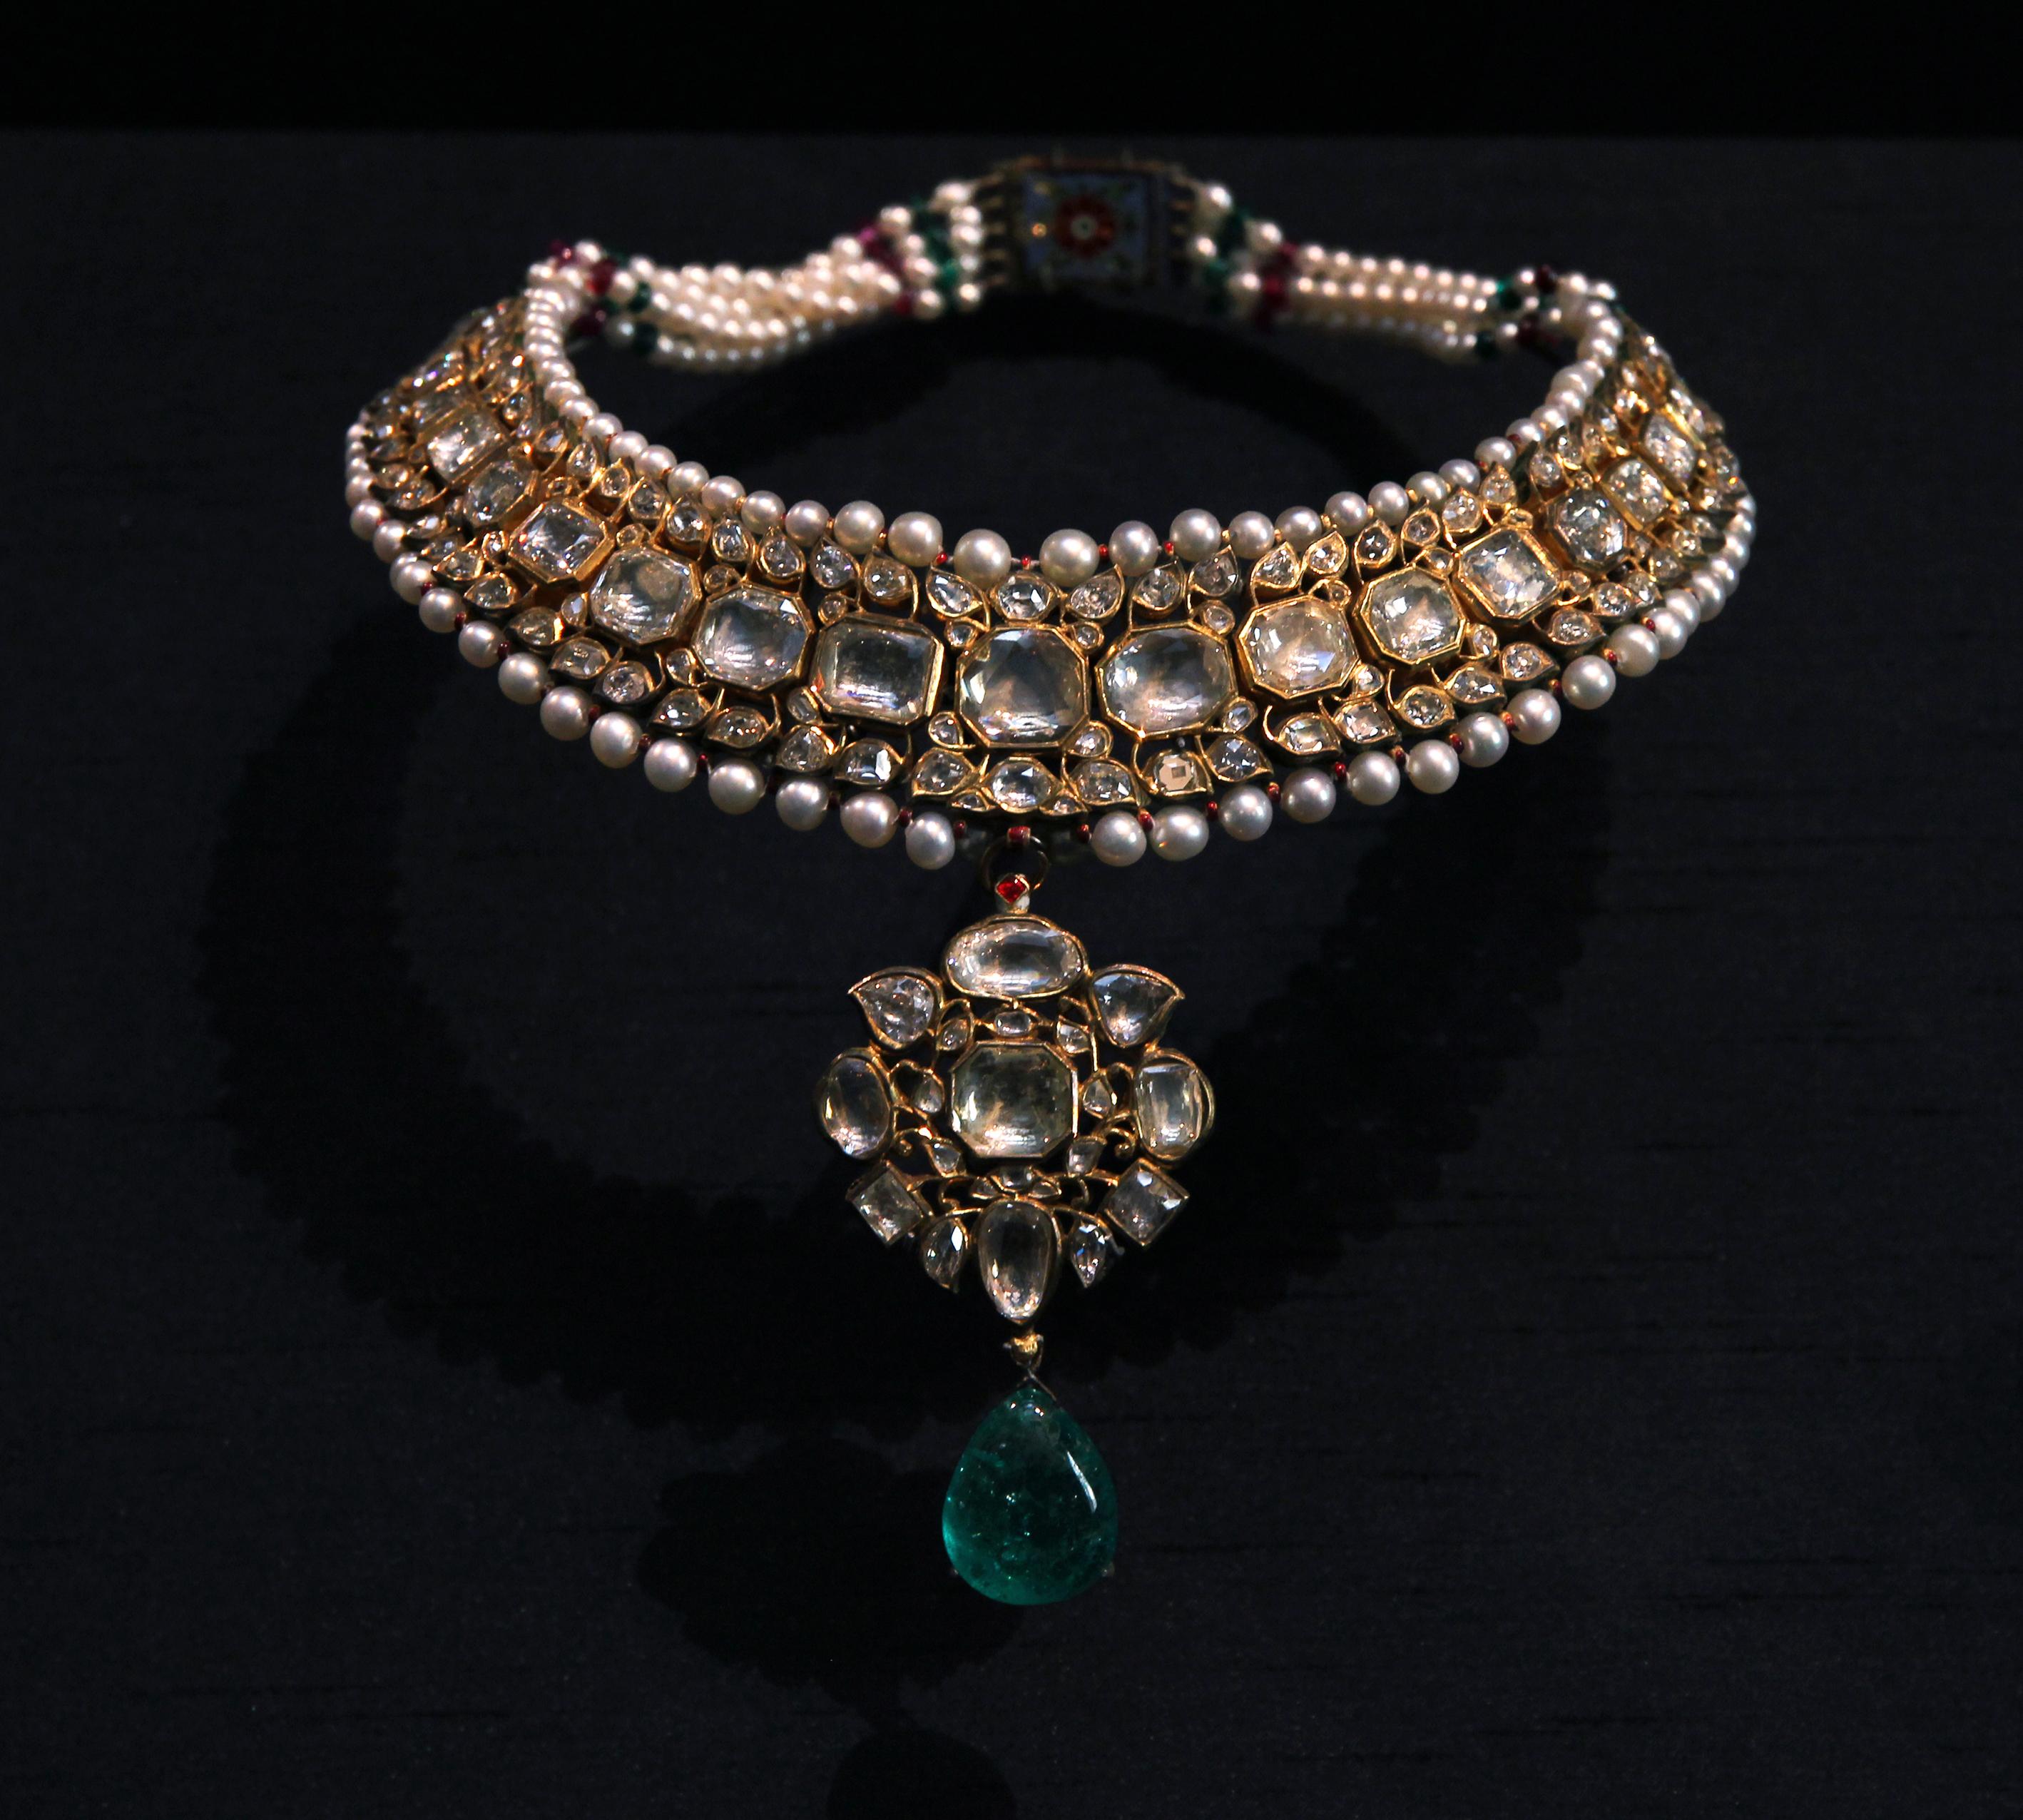 File:British Museum The Islamic world Necklace Kundan India